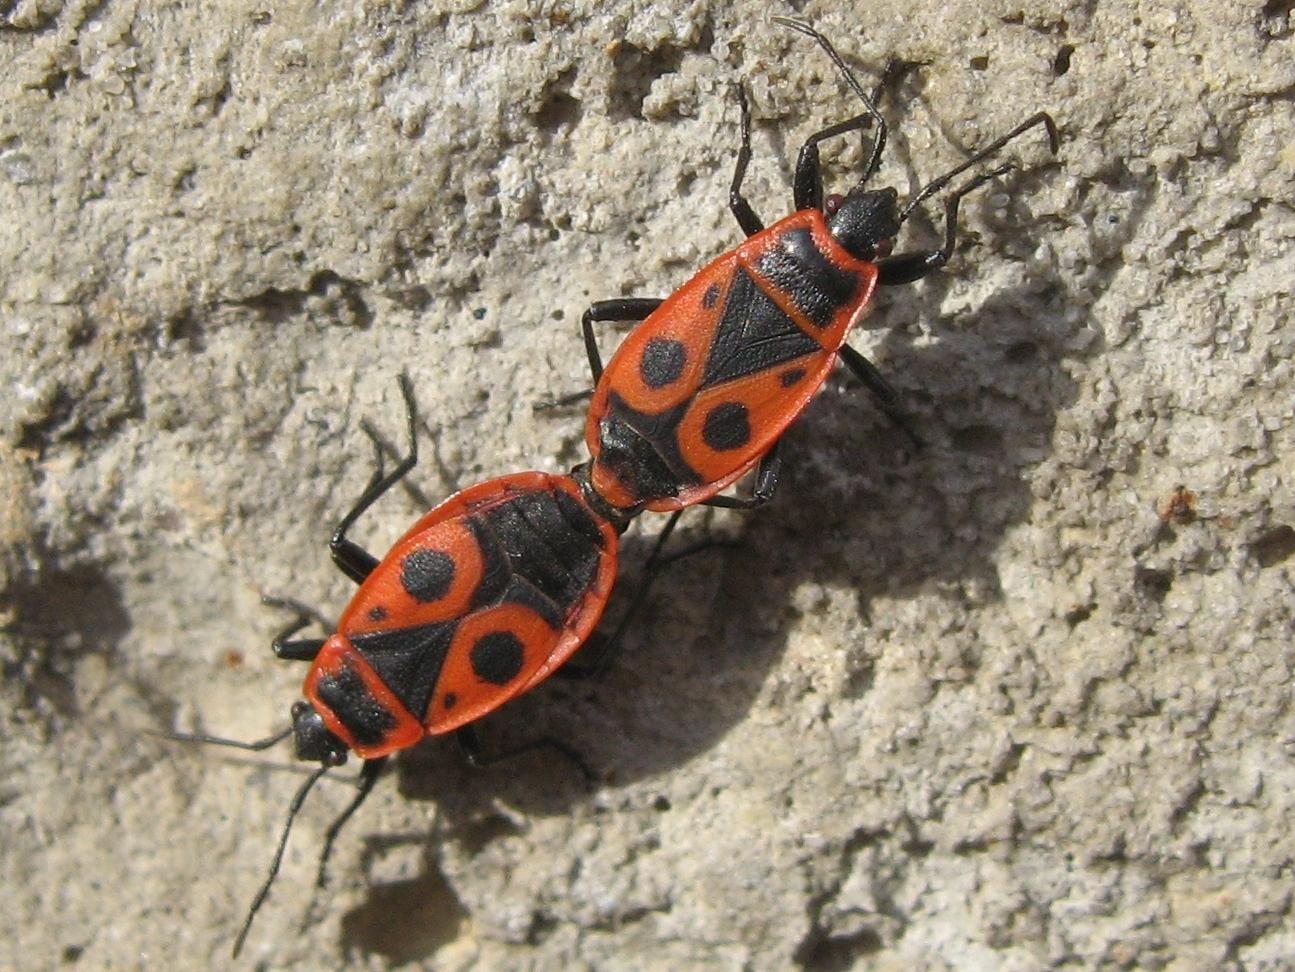 molbiol.ru -> Зимние насекомые: http://molbiol.ru/forums/index.php?showtopic=566369&st=50